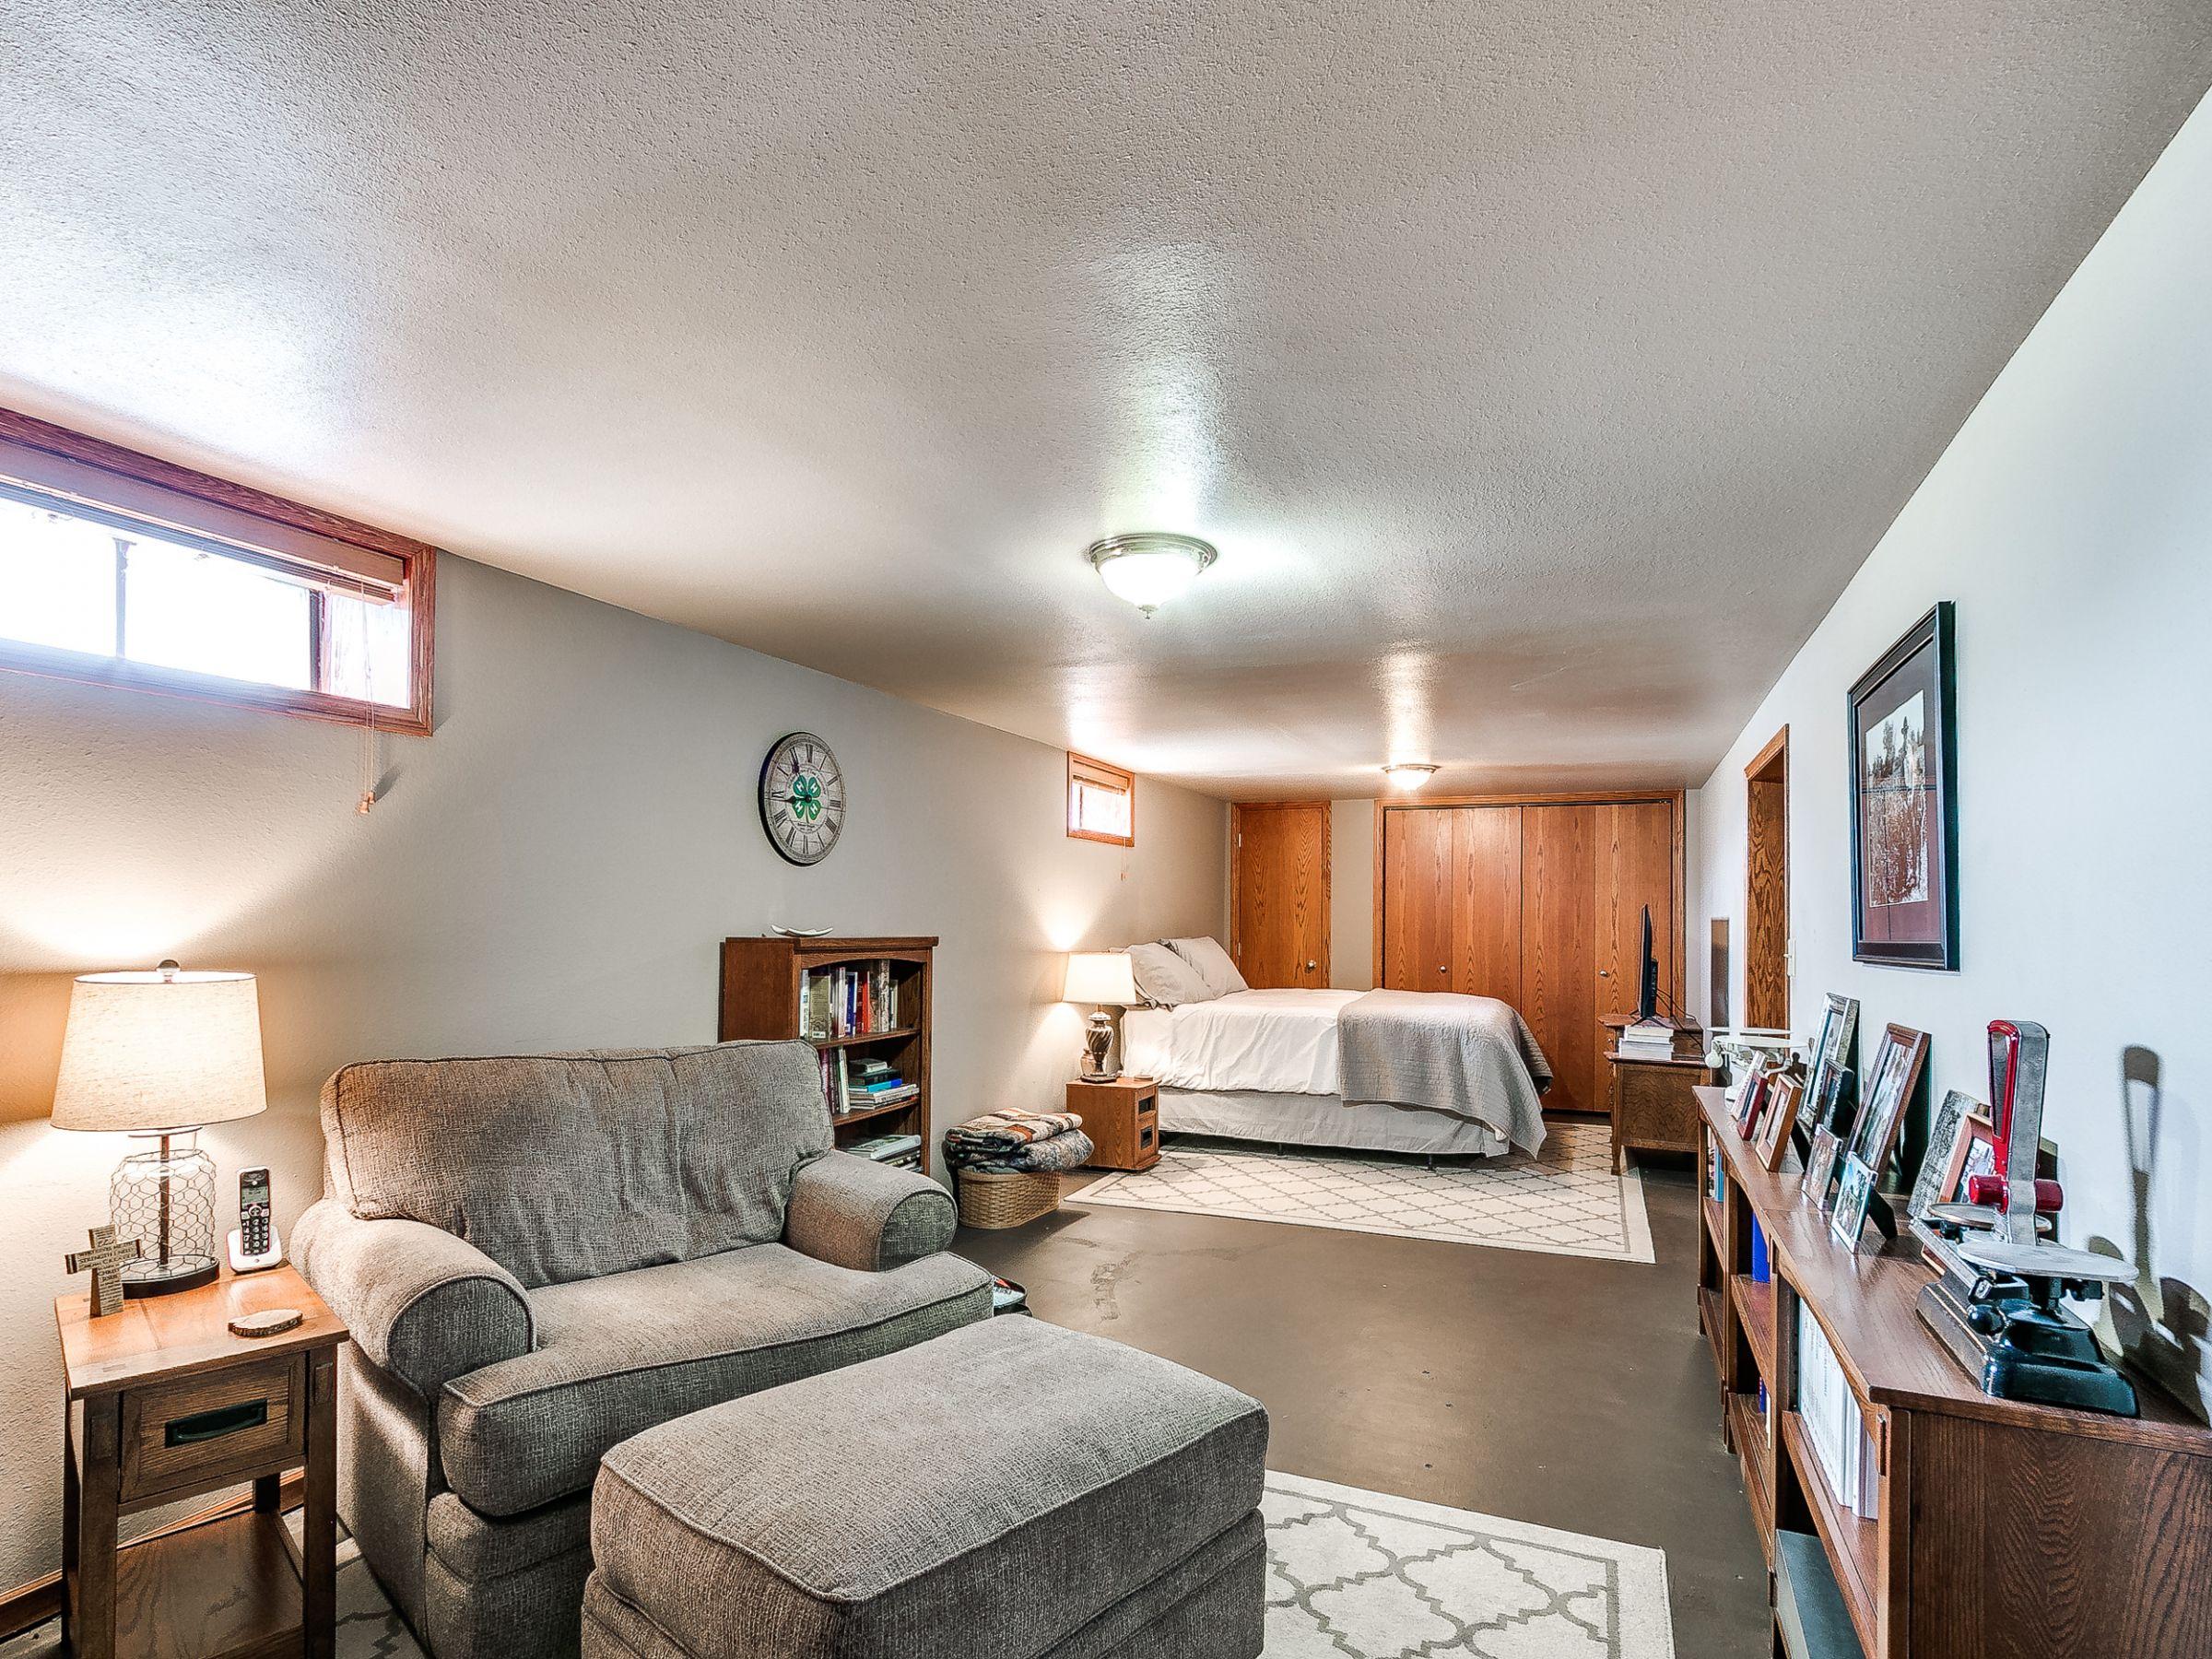 residential-warren-county-iowa-3-acres-listing-number-15516-13-2021-05-12-145115.jpg